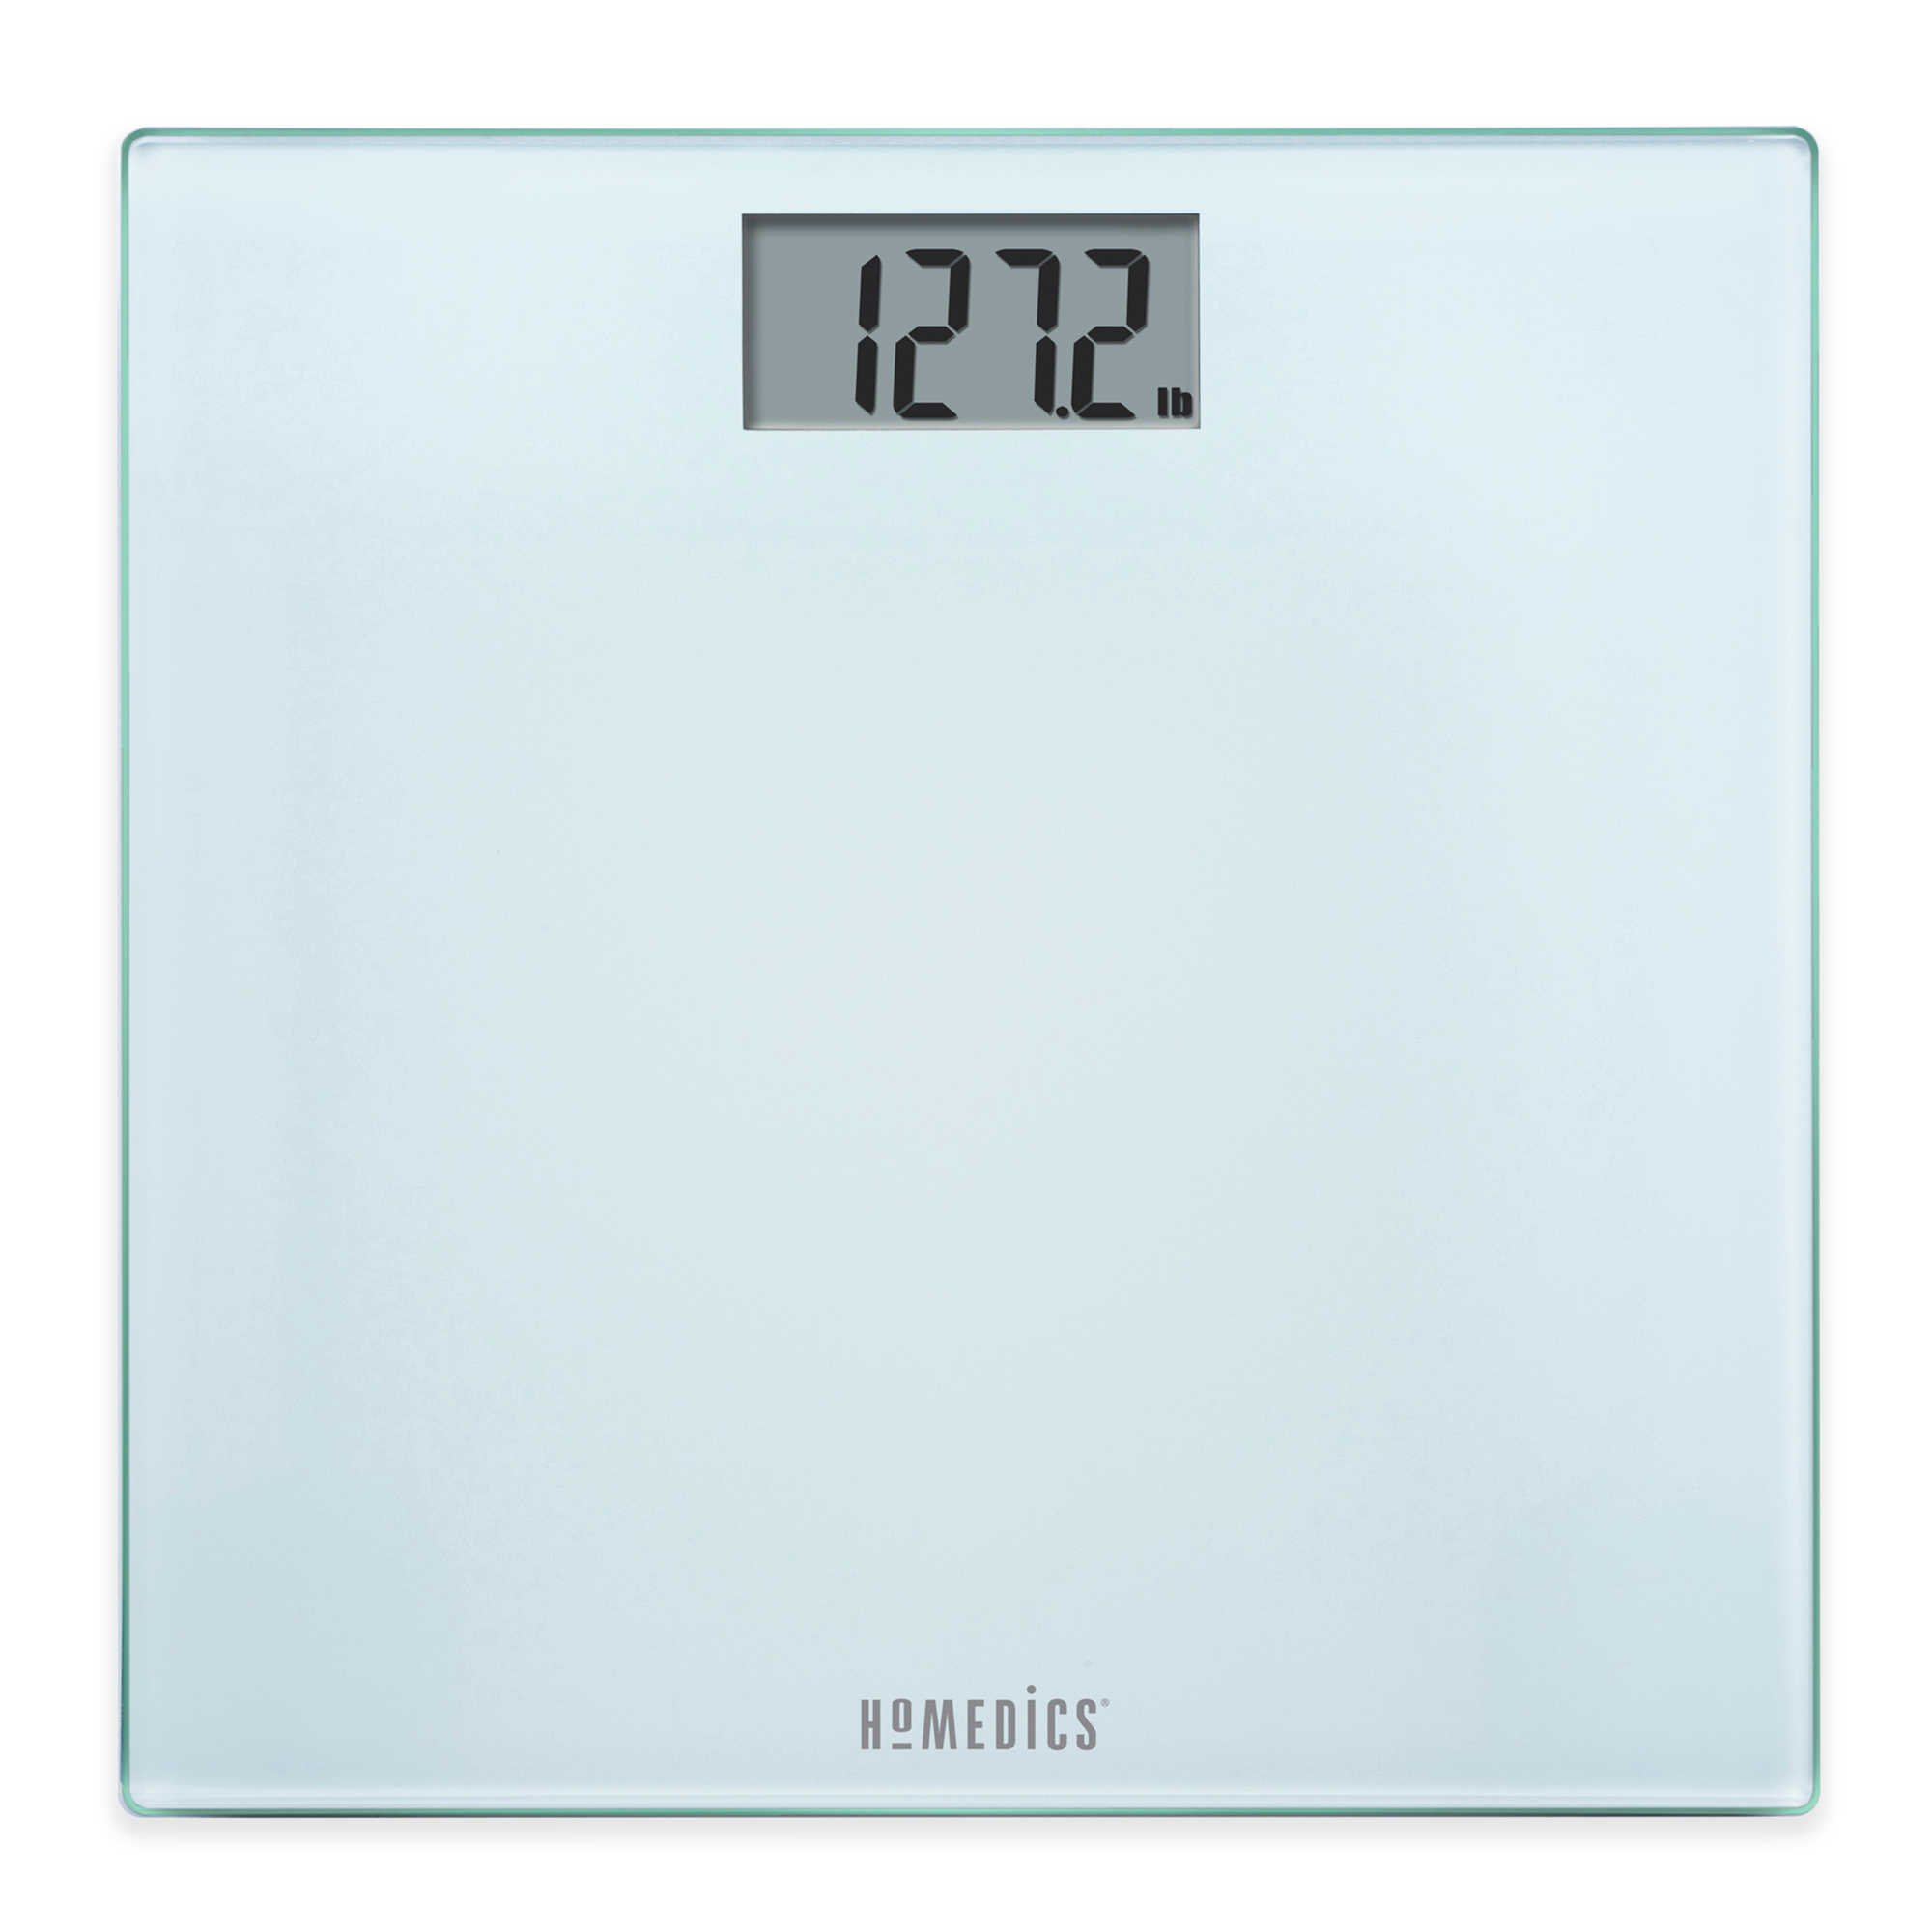 Home 187 homedics lcd digital bath scale - Homedics Glass Digital Bathroom Scale In Frosted White